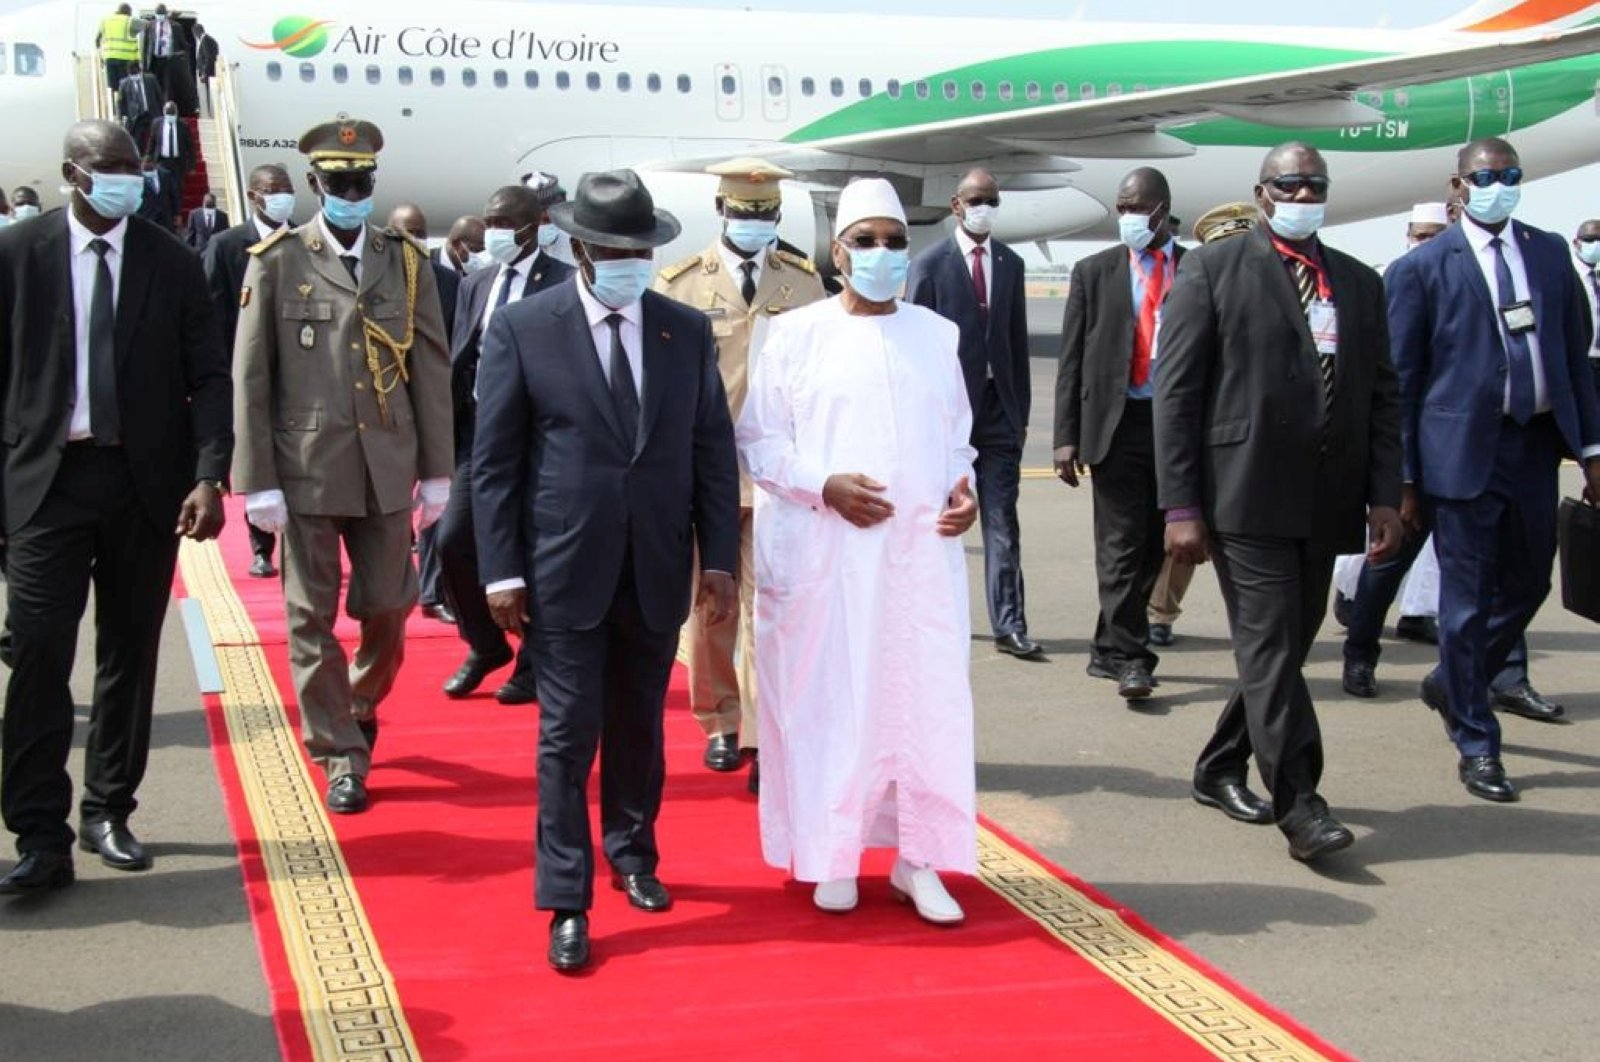 Mali's President Ibrahim Boubacar Keita walks with his Ivory Coast counterpart Alassane Ouattara upon his arrival, Bamako, July 23, 2020. (REUTERS Photo)